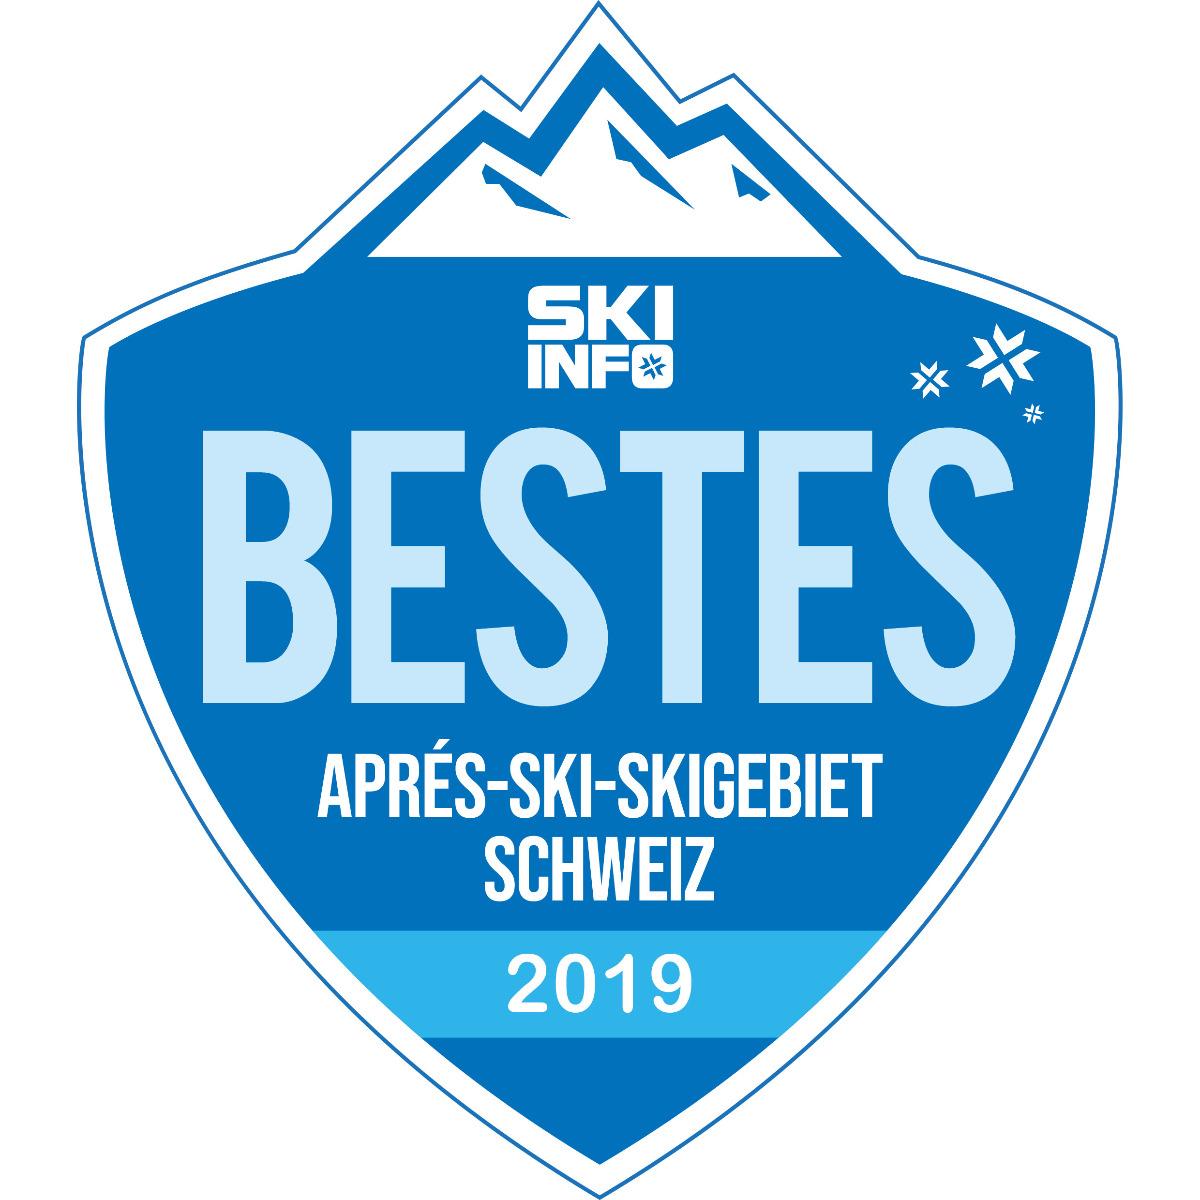 Bestes Aprés-Ski-Skigebiet Schweiz 2018/2019